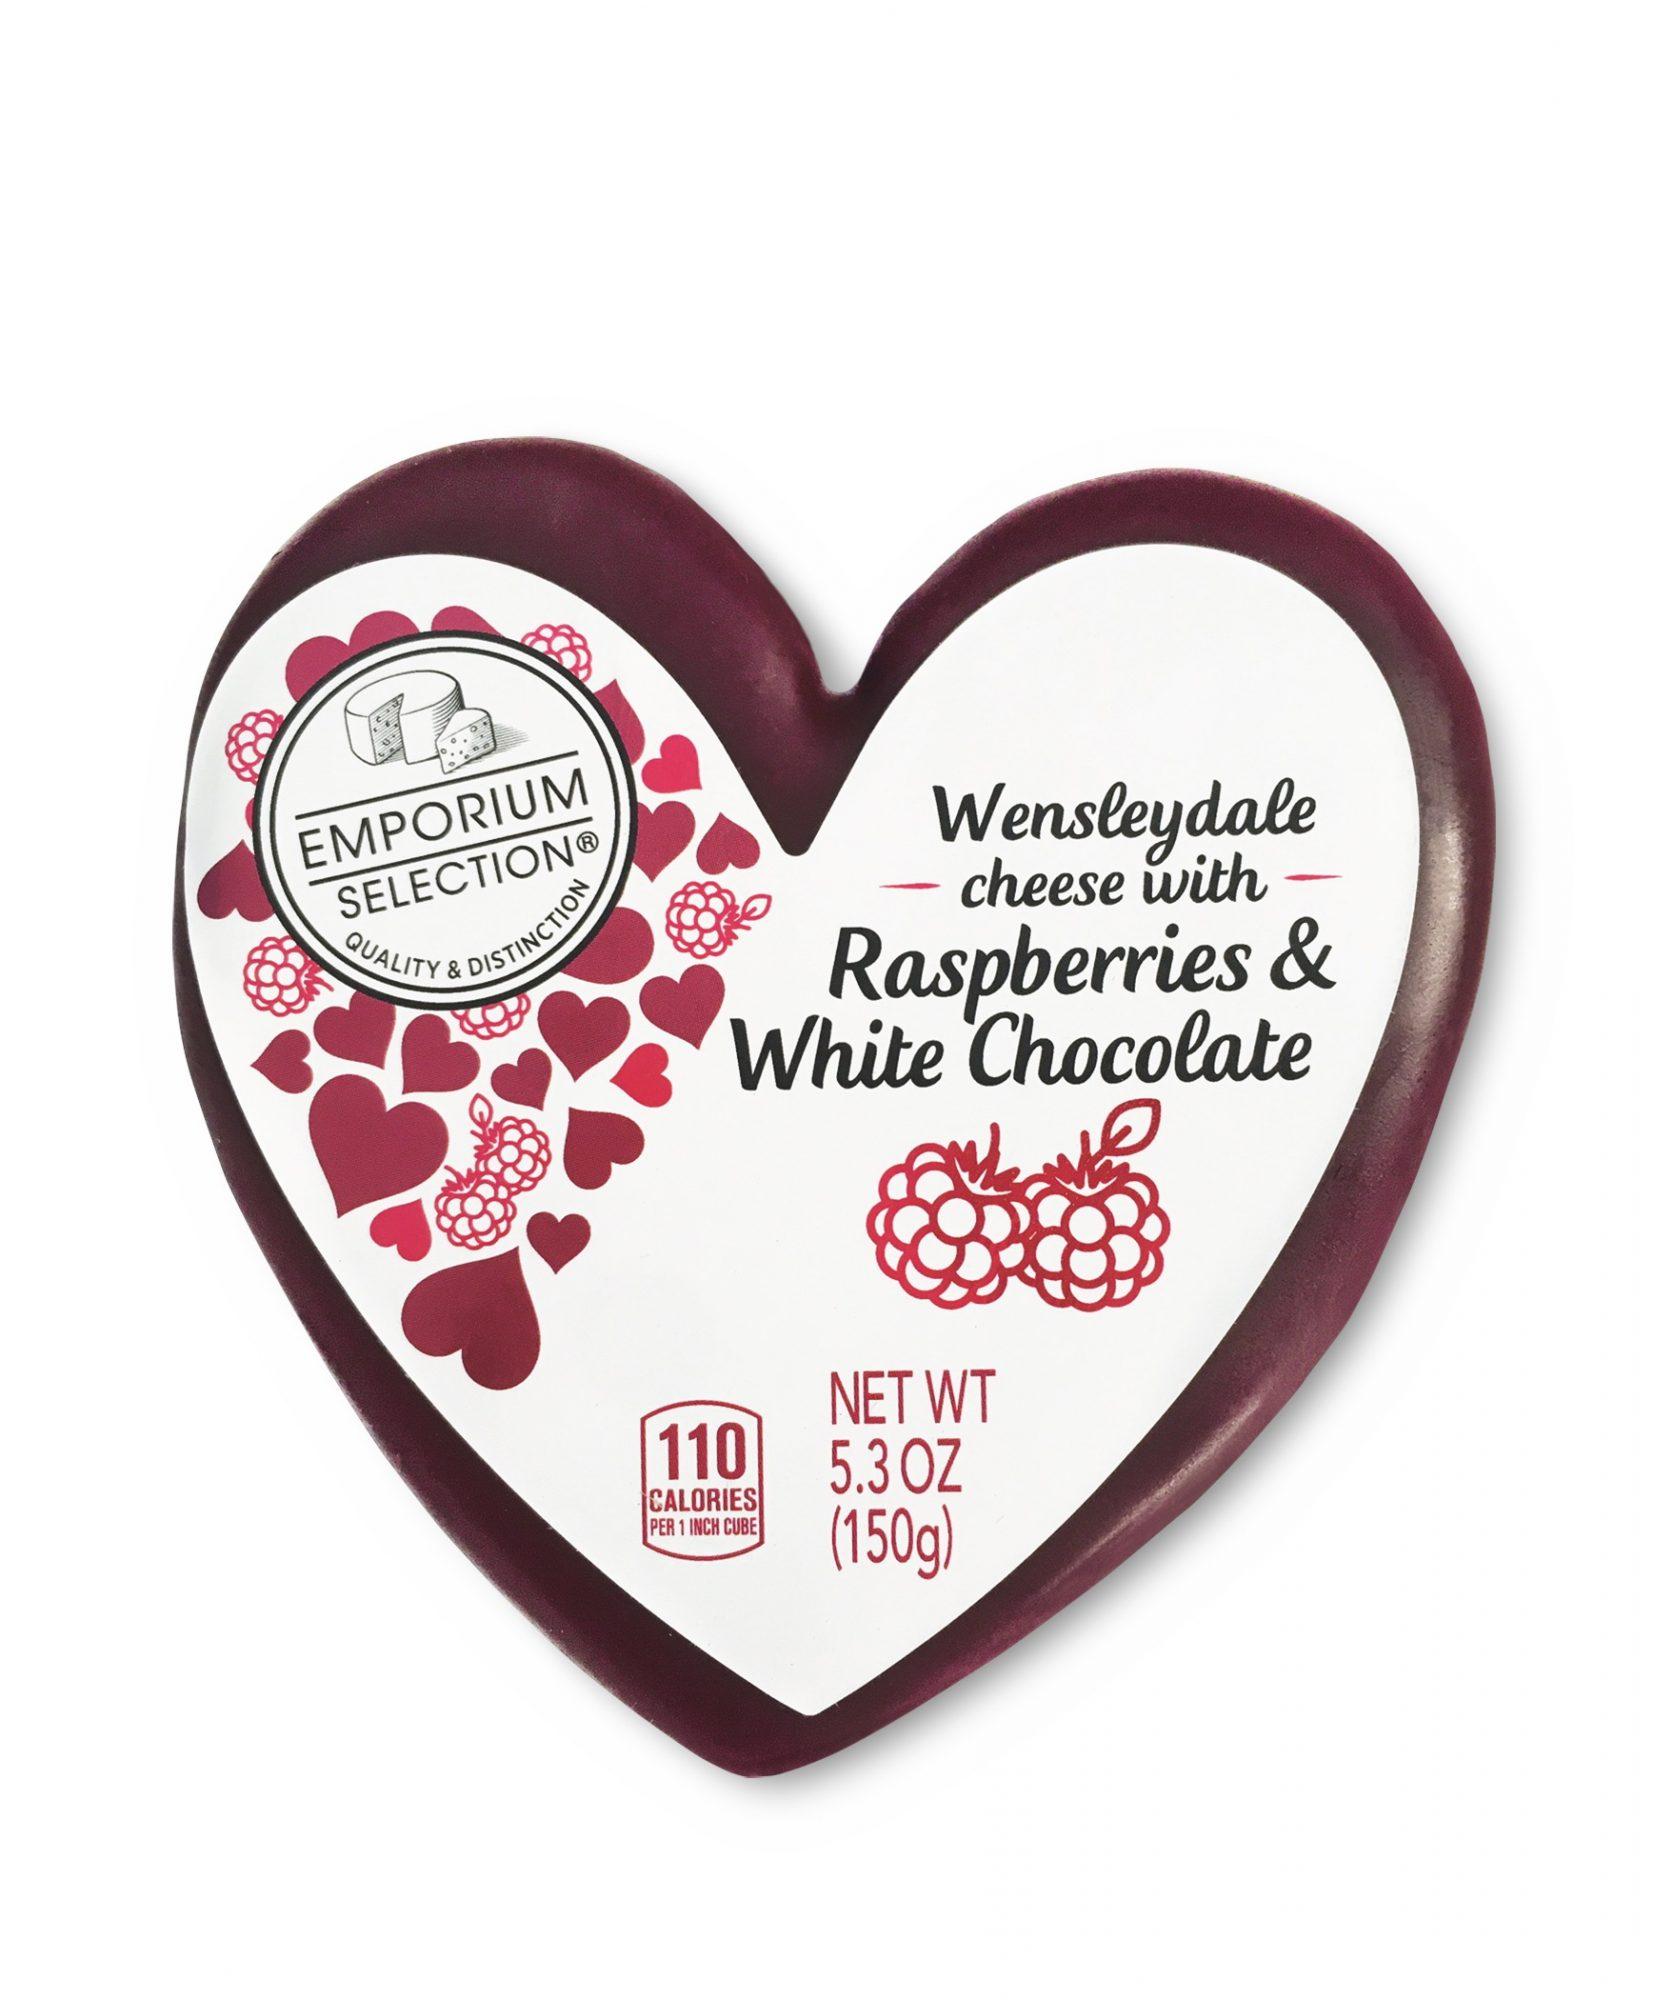 emporium-selection-valentines-day-cheese-wensleydale-raspberry-copy.jpg